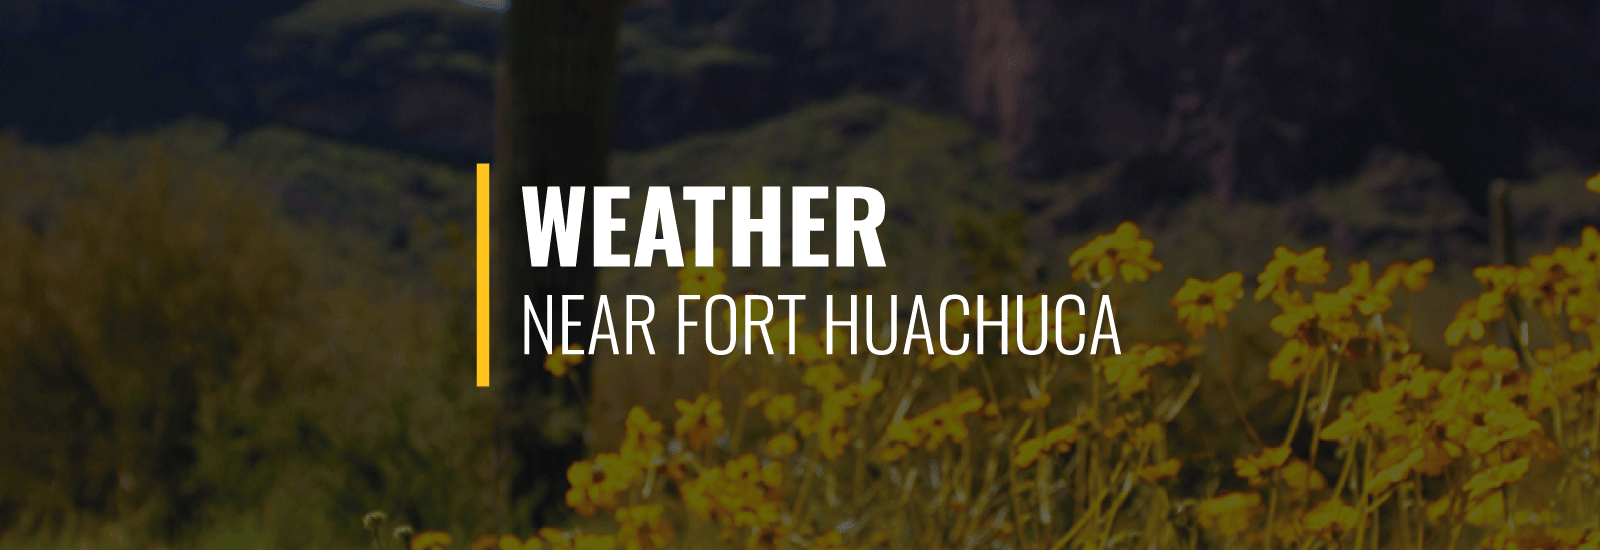 Fort Huachuca Weather